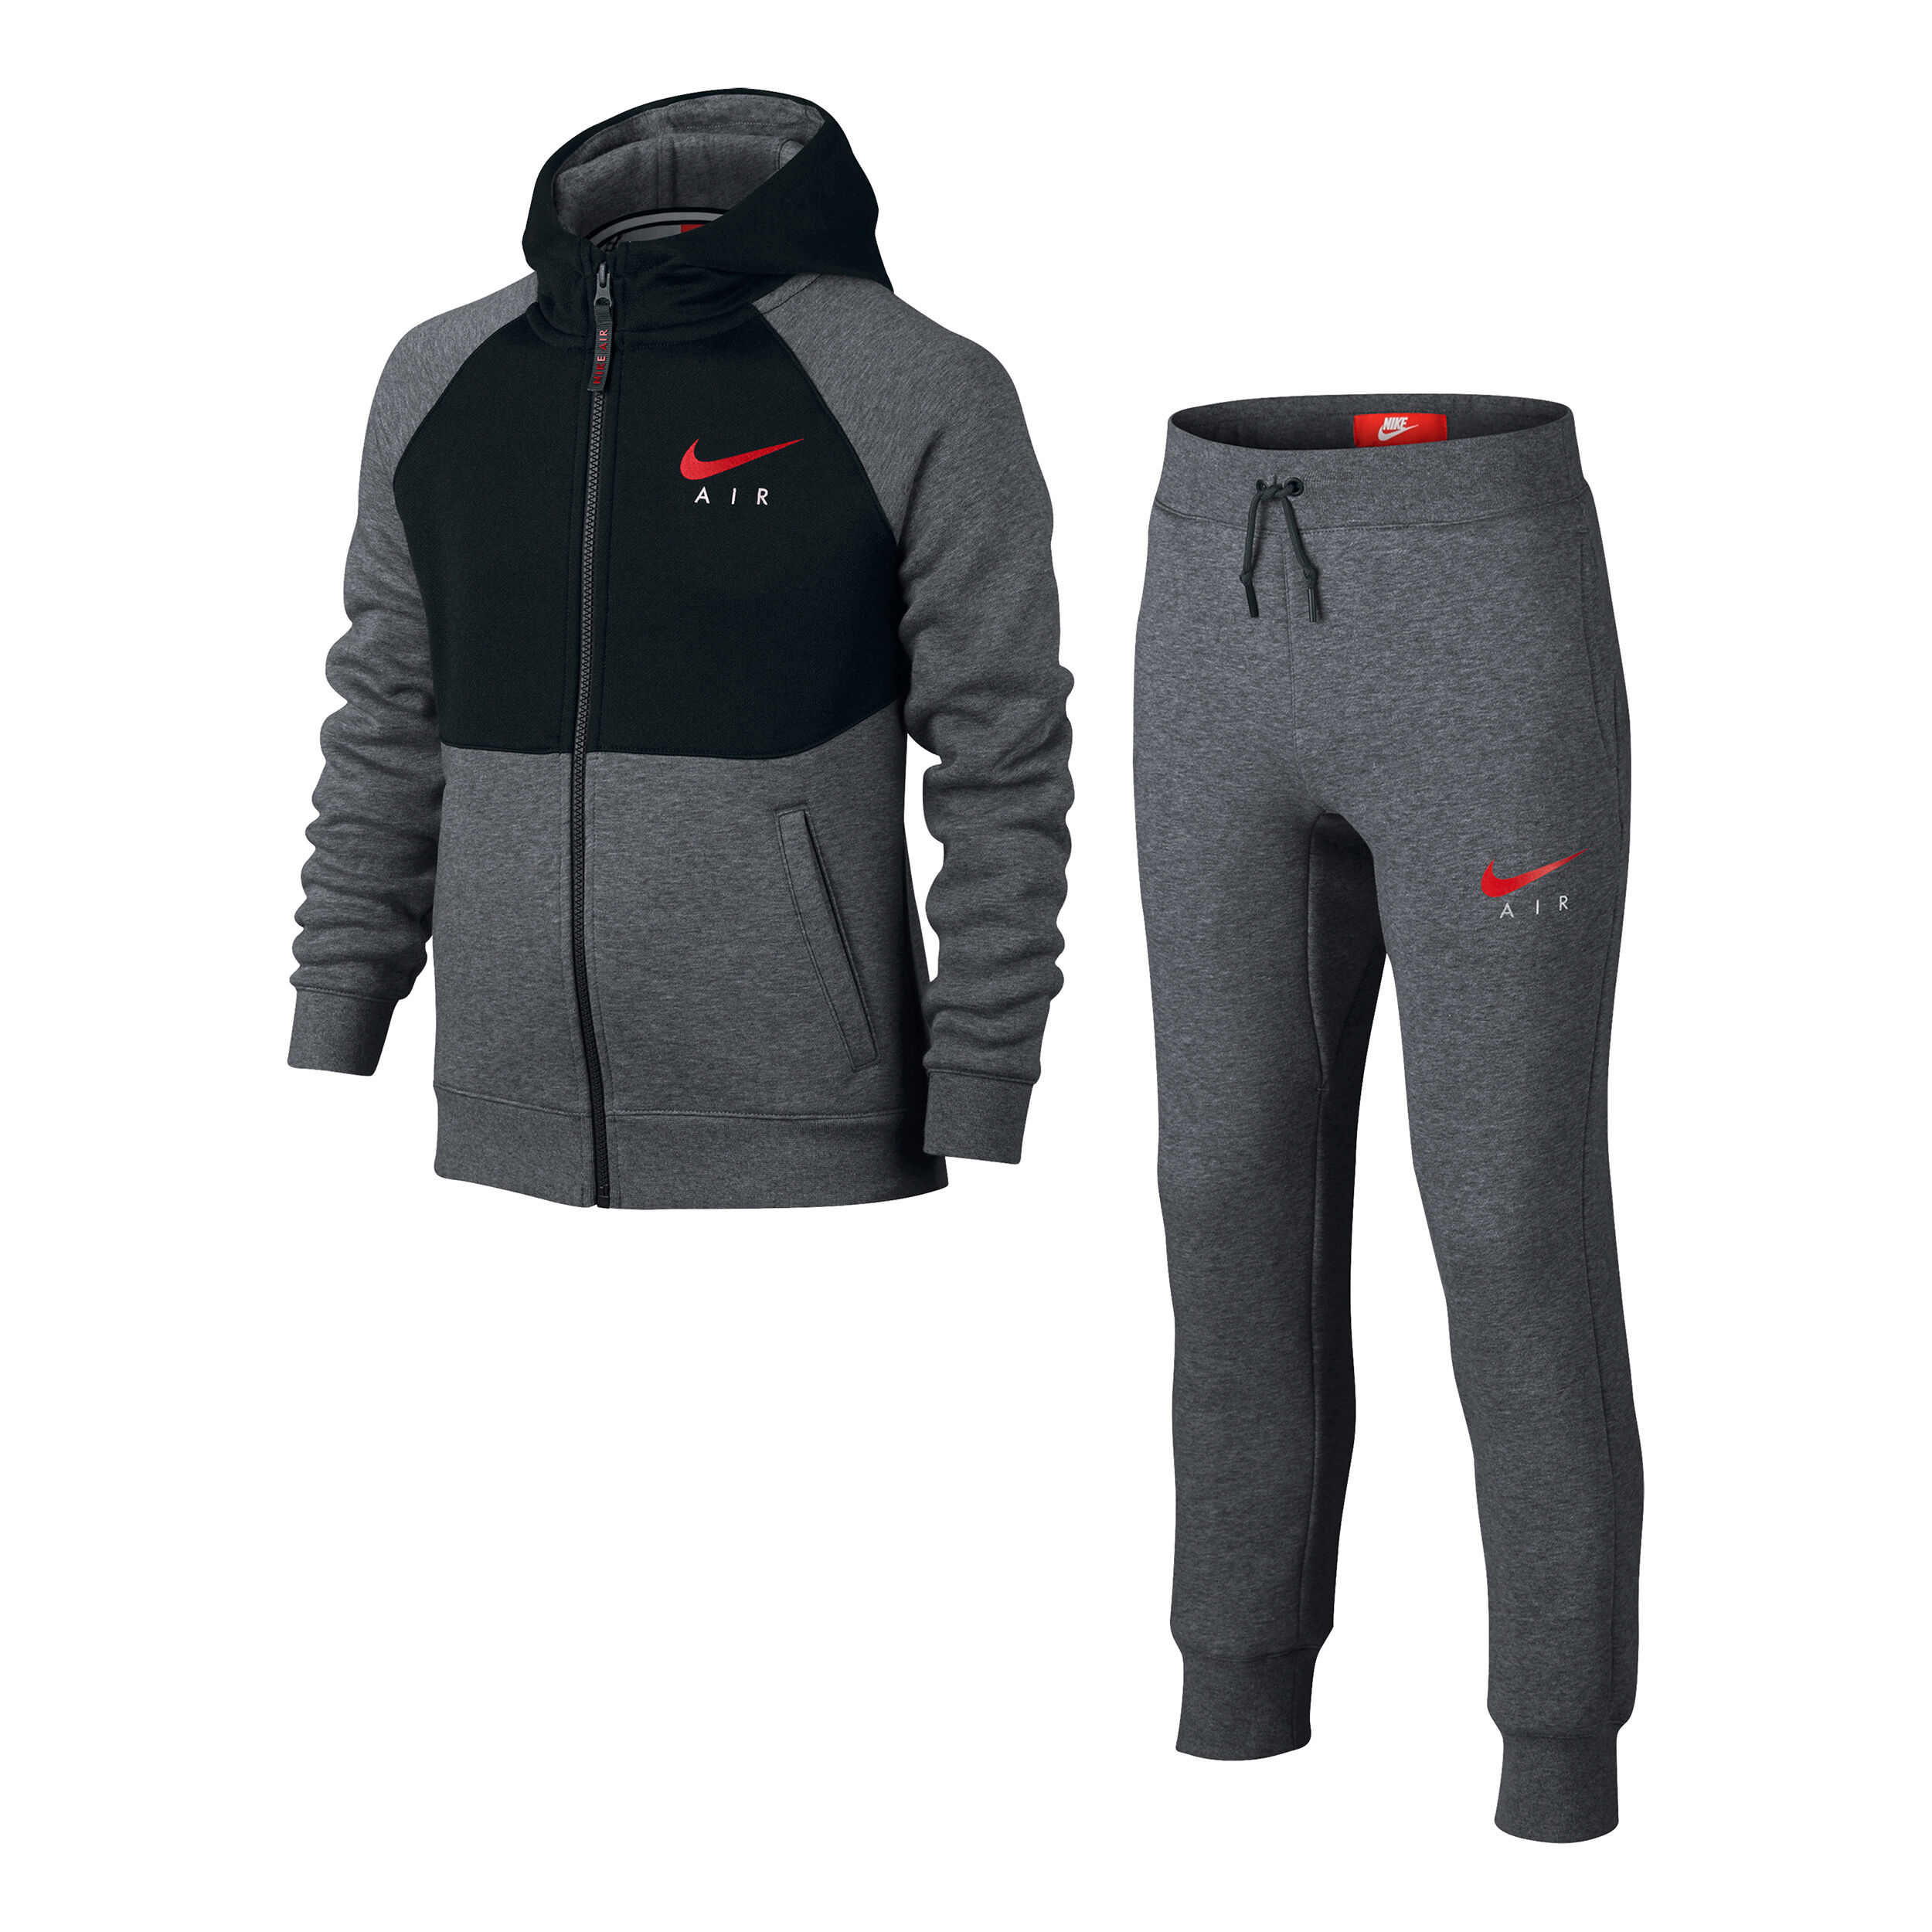 Details zu Nike Air Vlies Trainingsanzug Herren Schwarz Fleece Jacke + Hose